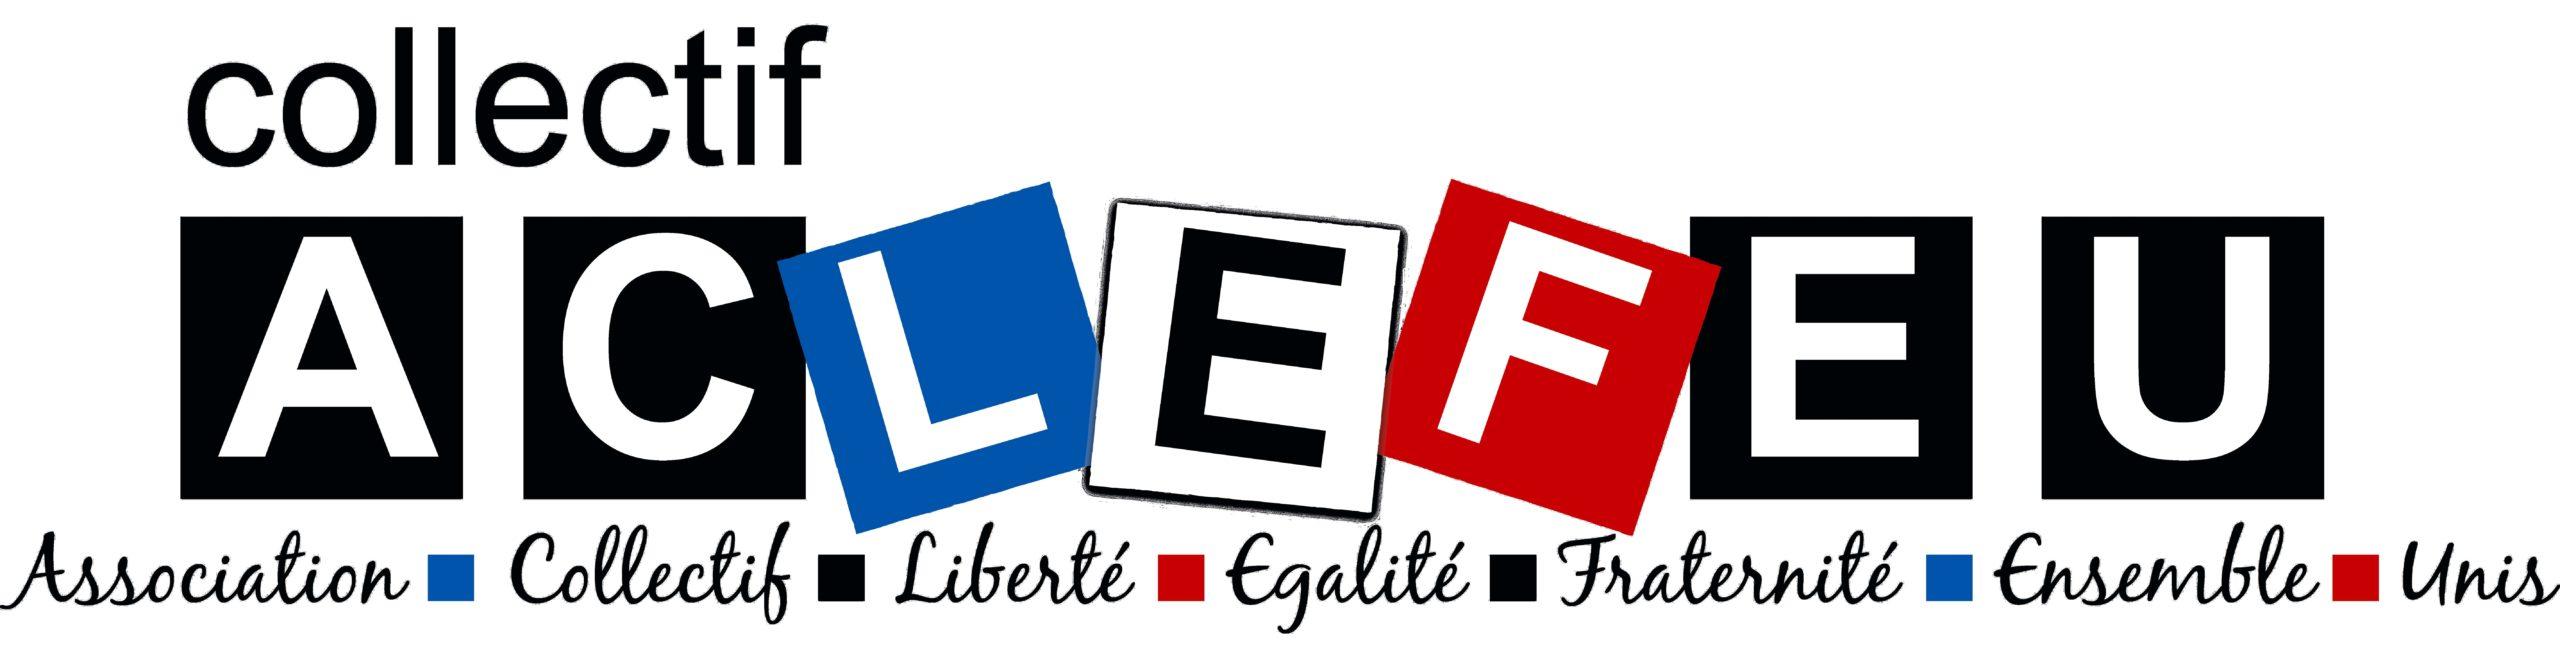 ACLEFEU - Site Web du Collectif Aclefeu